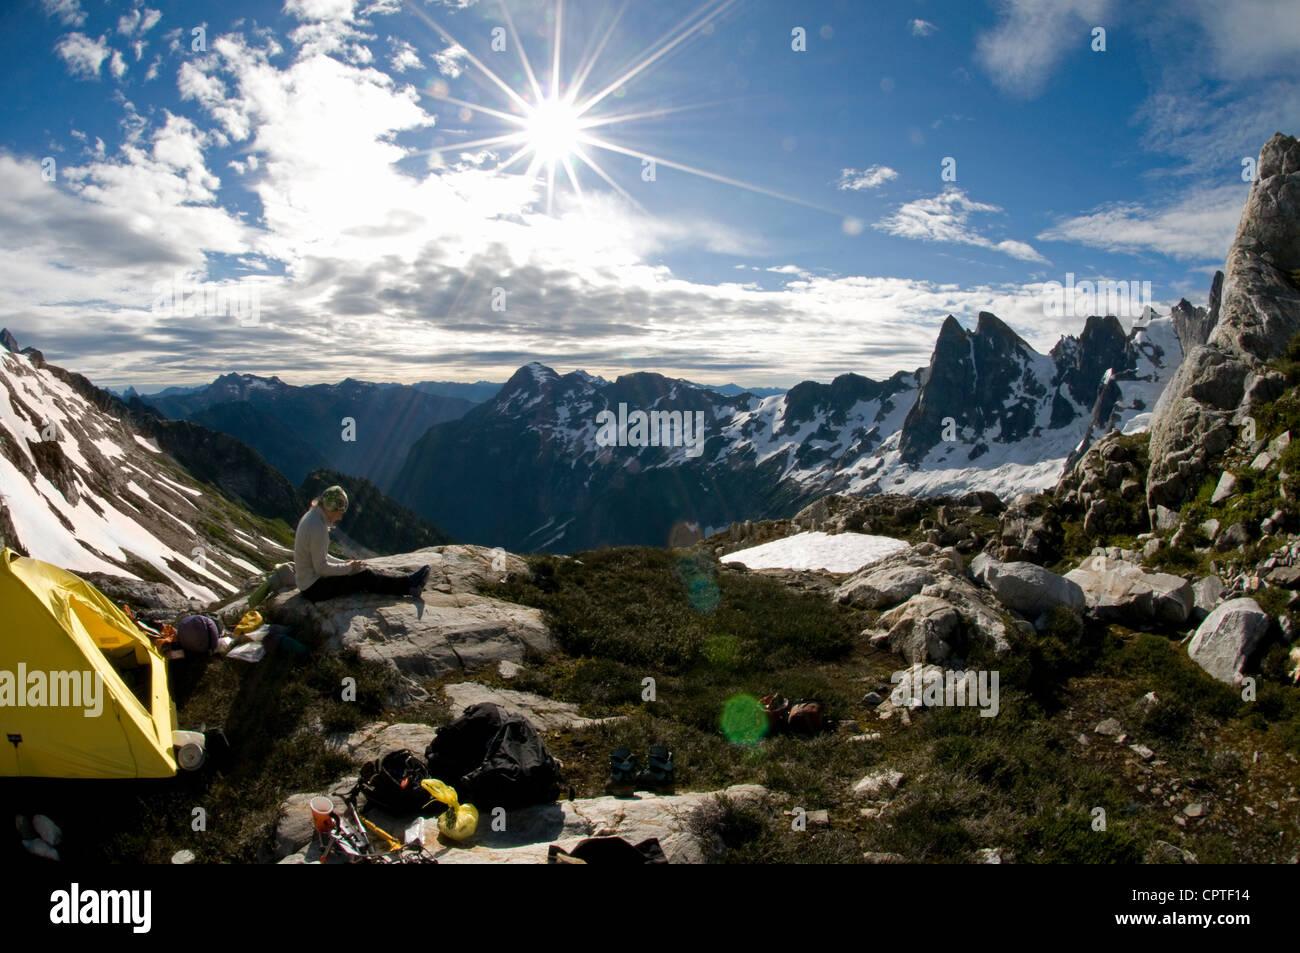 Backpacker in Mountain Camp, Picket Pass, North Cascades National Park, WA, USA Stockbild